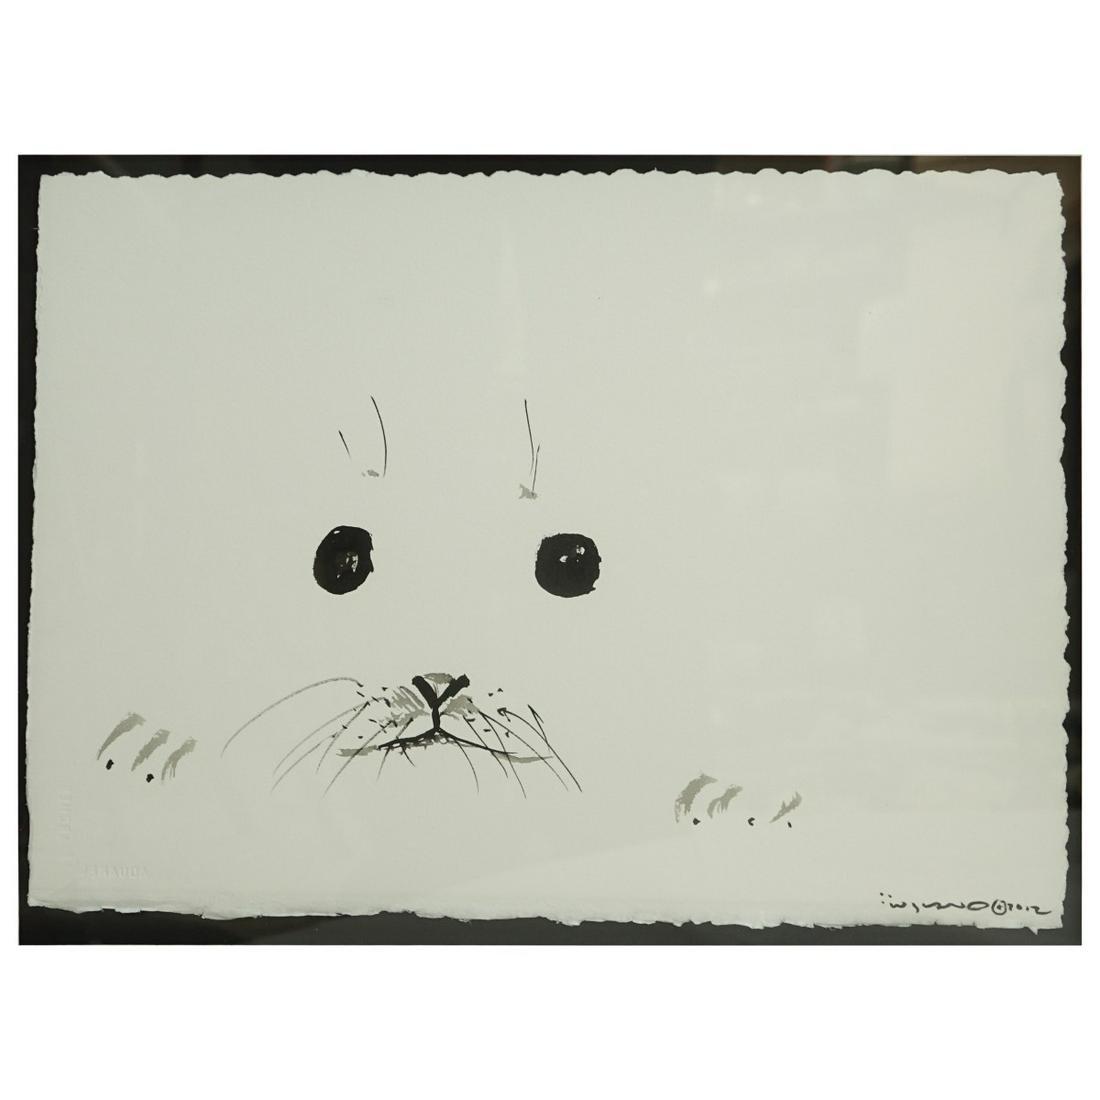 Robert Wyland (1956 - ) Sumi Ink Seal Face